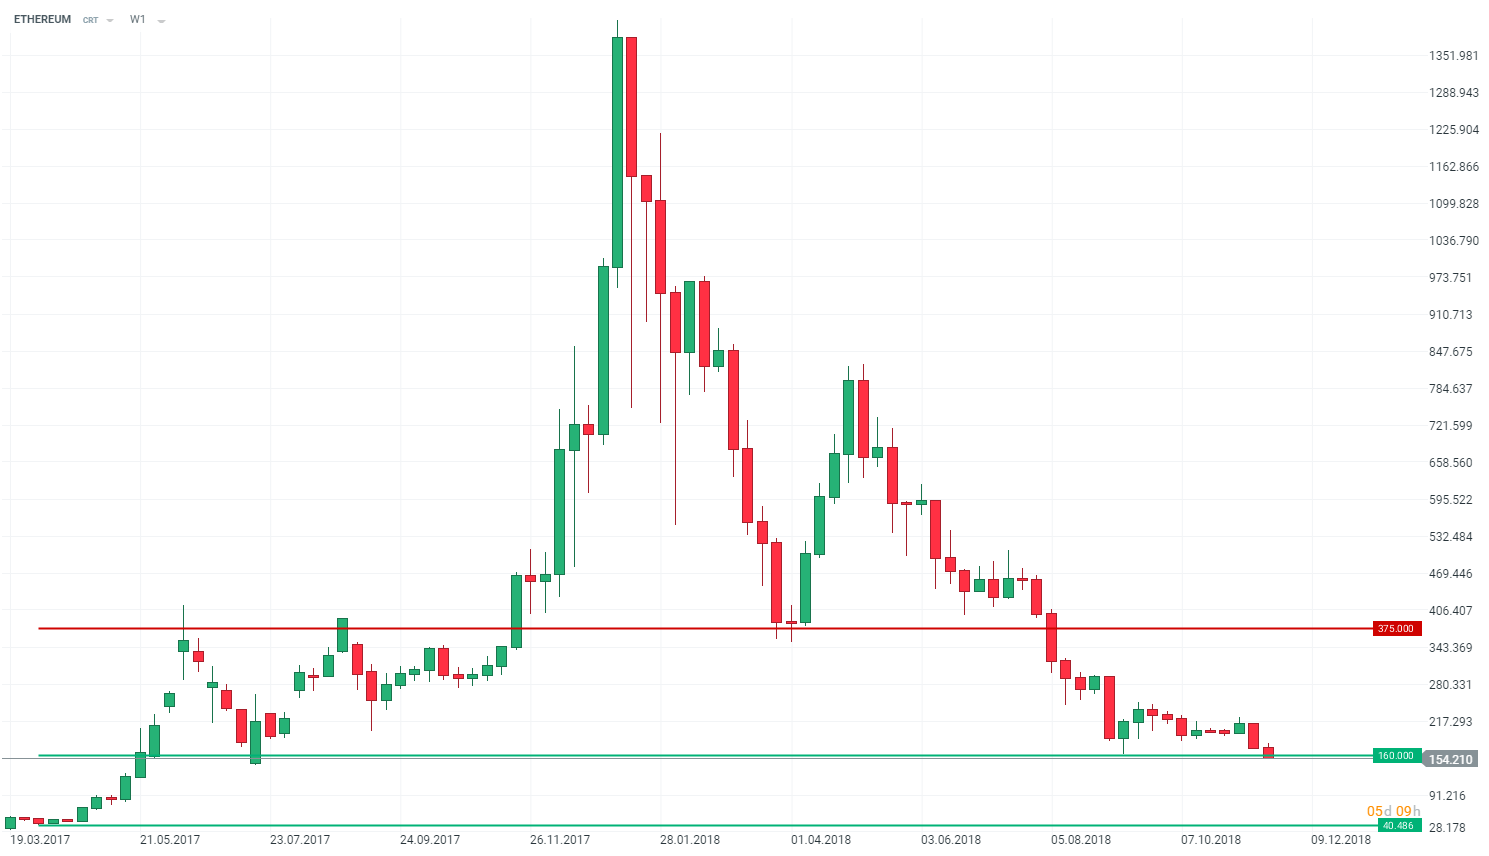 Co dalej z ceną Bitcoina 2